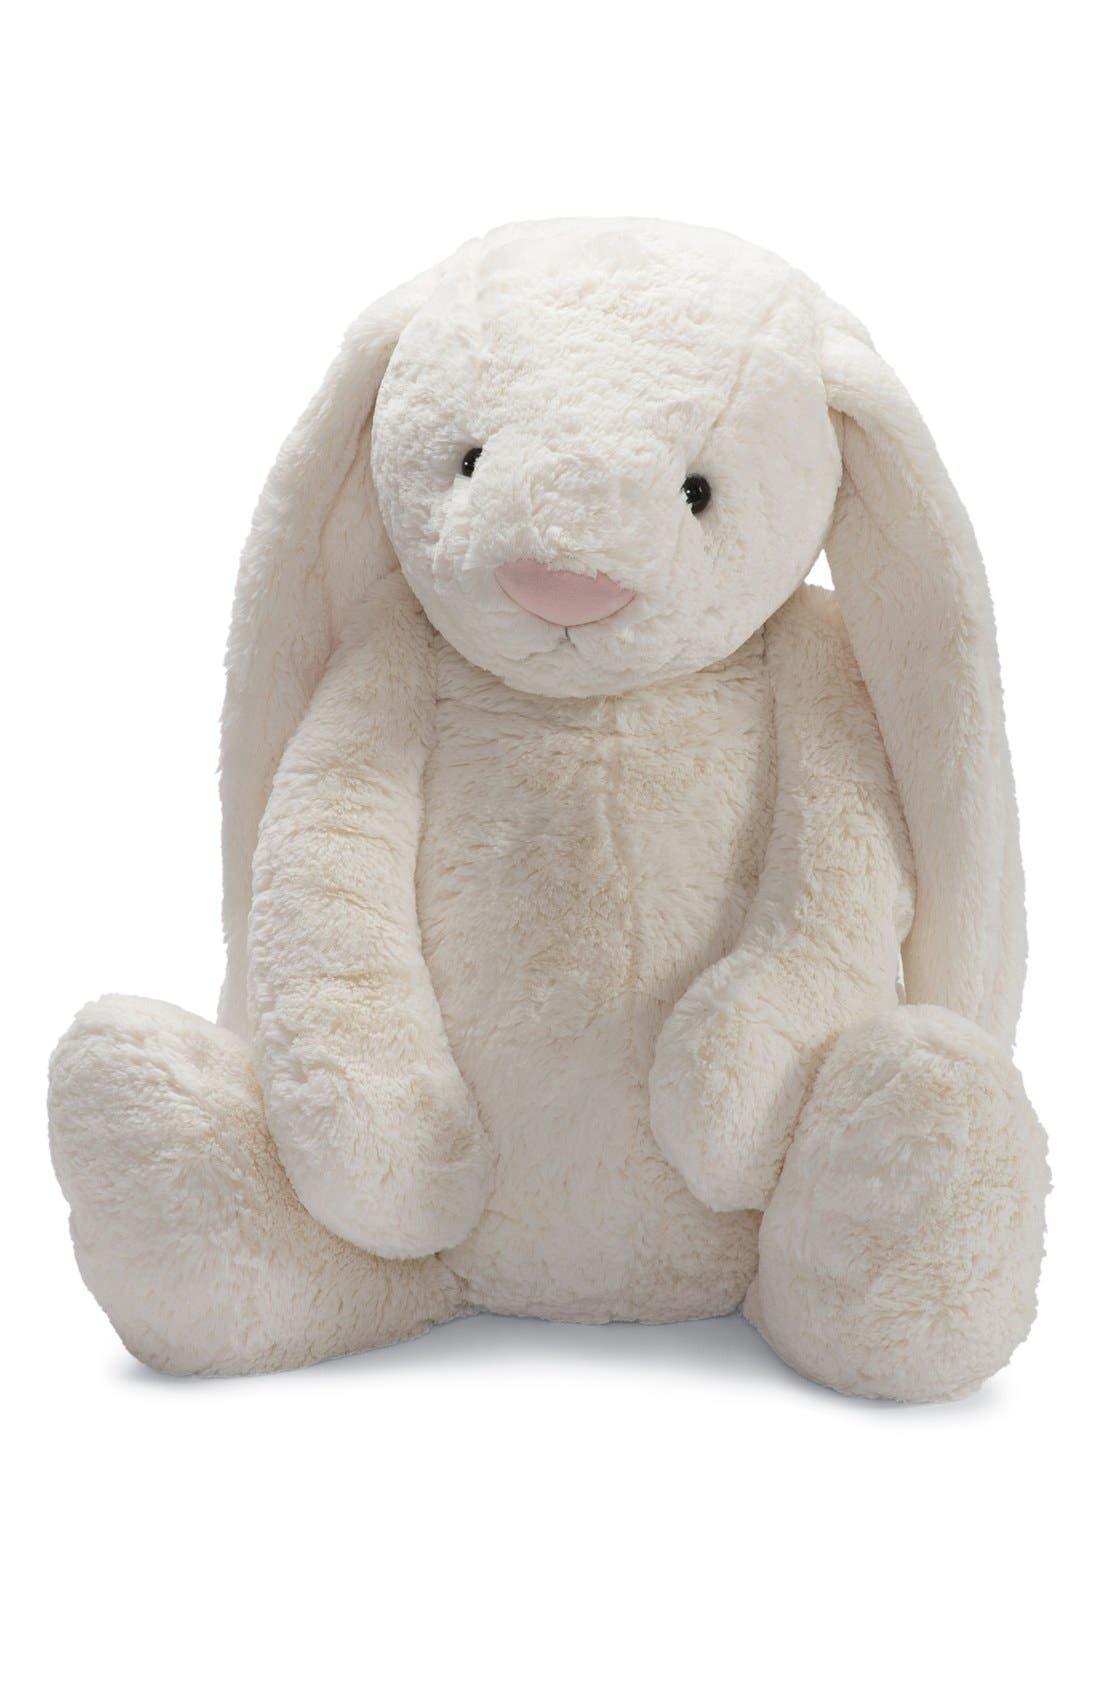 'Large Bashful Bunny' Stuffed Animal,                             Alternate thumbnail 3, color,                             250